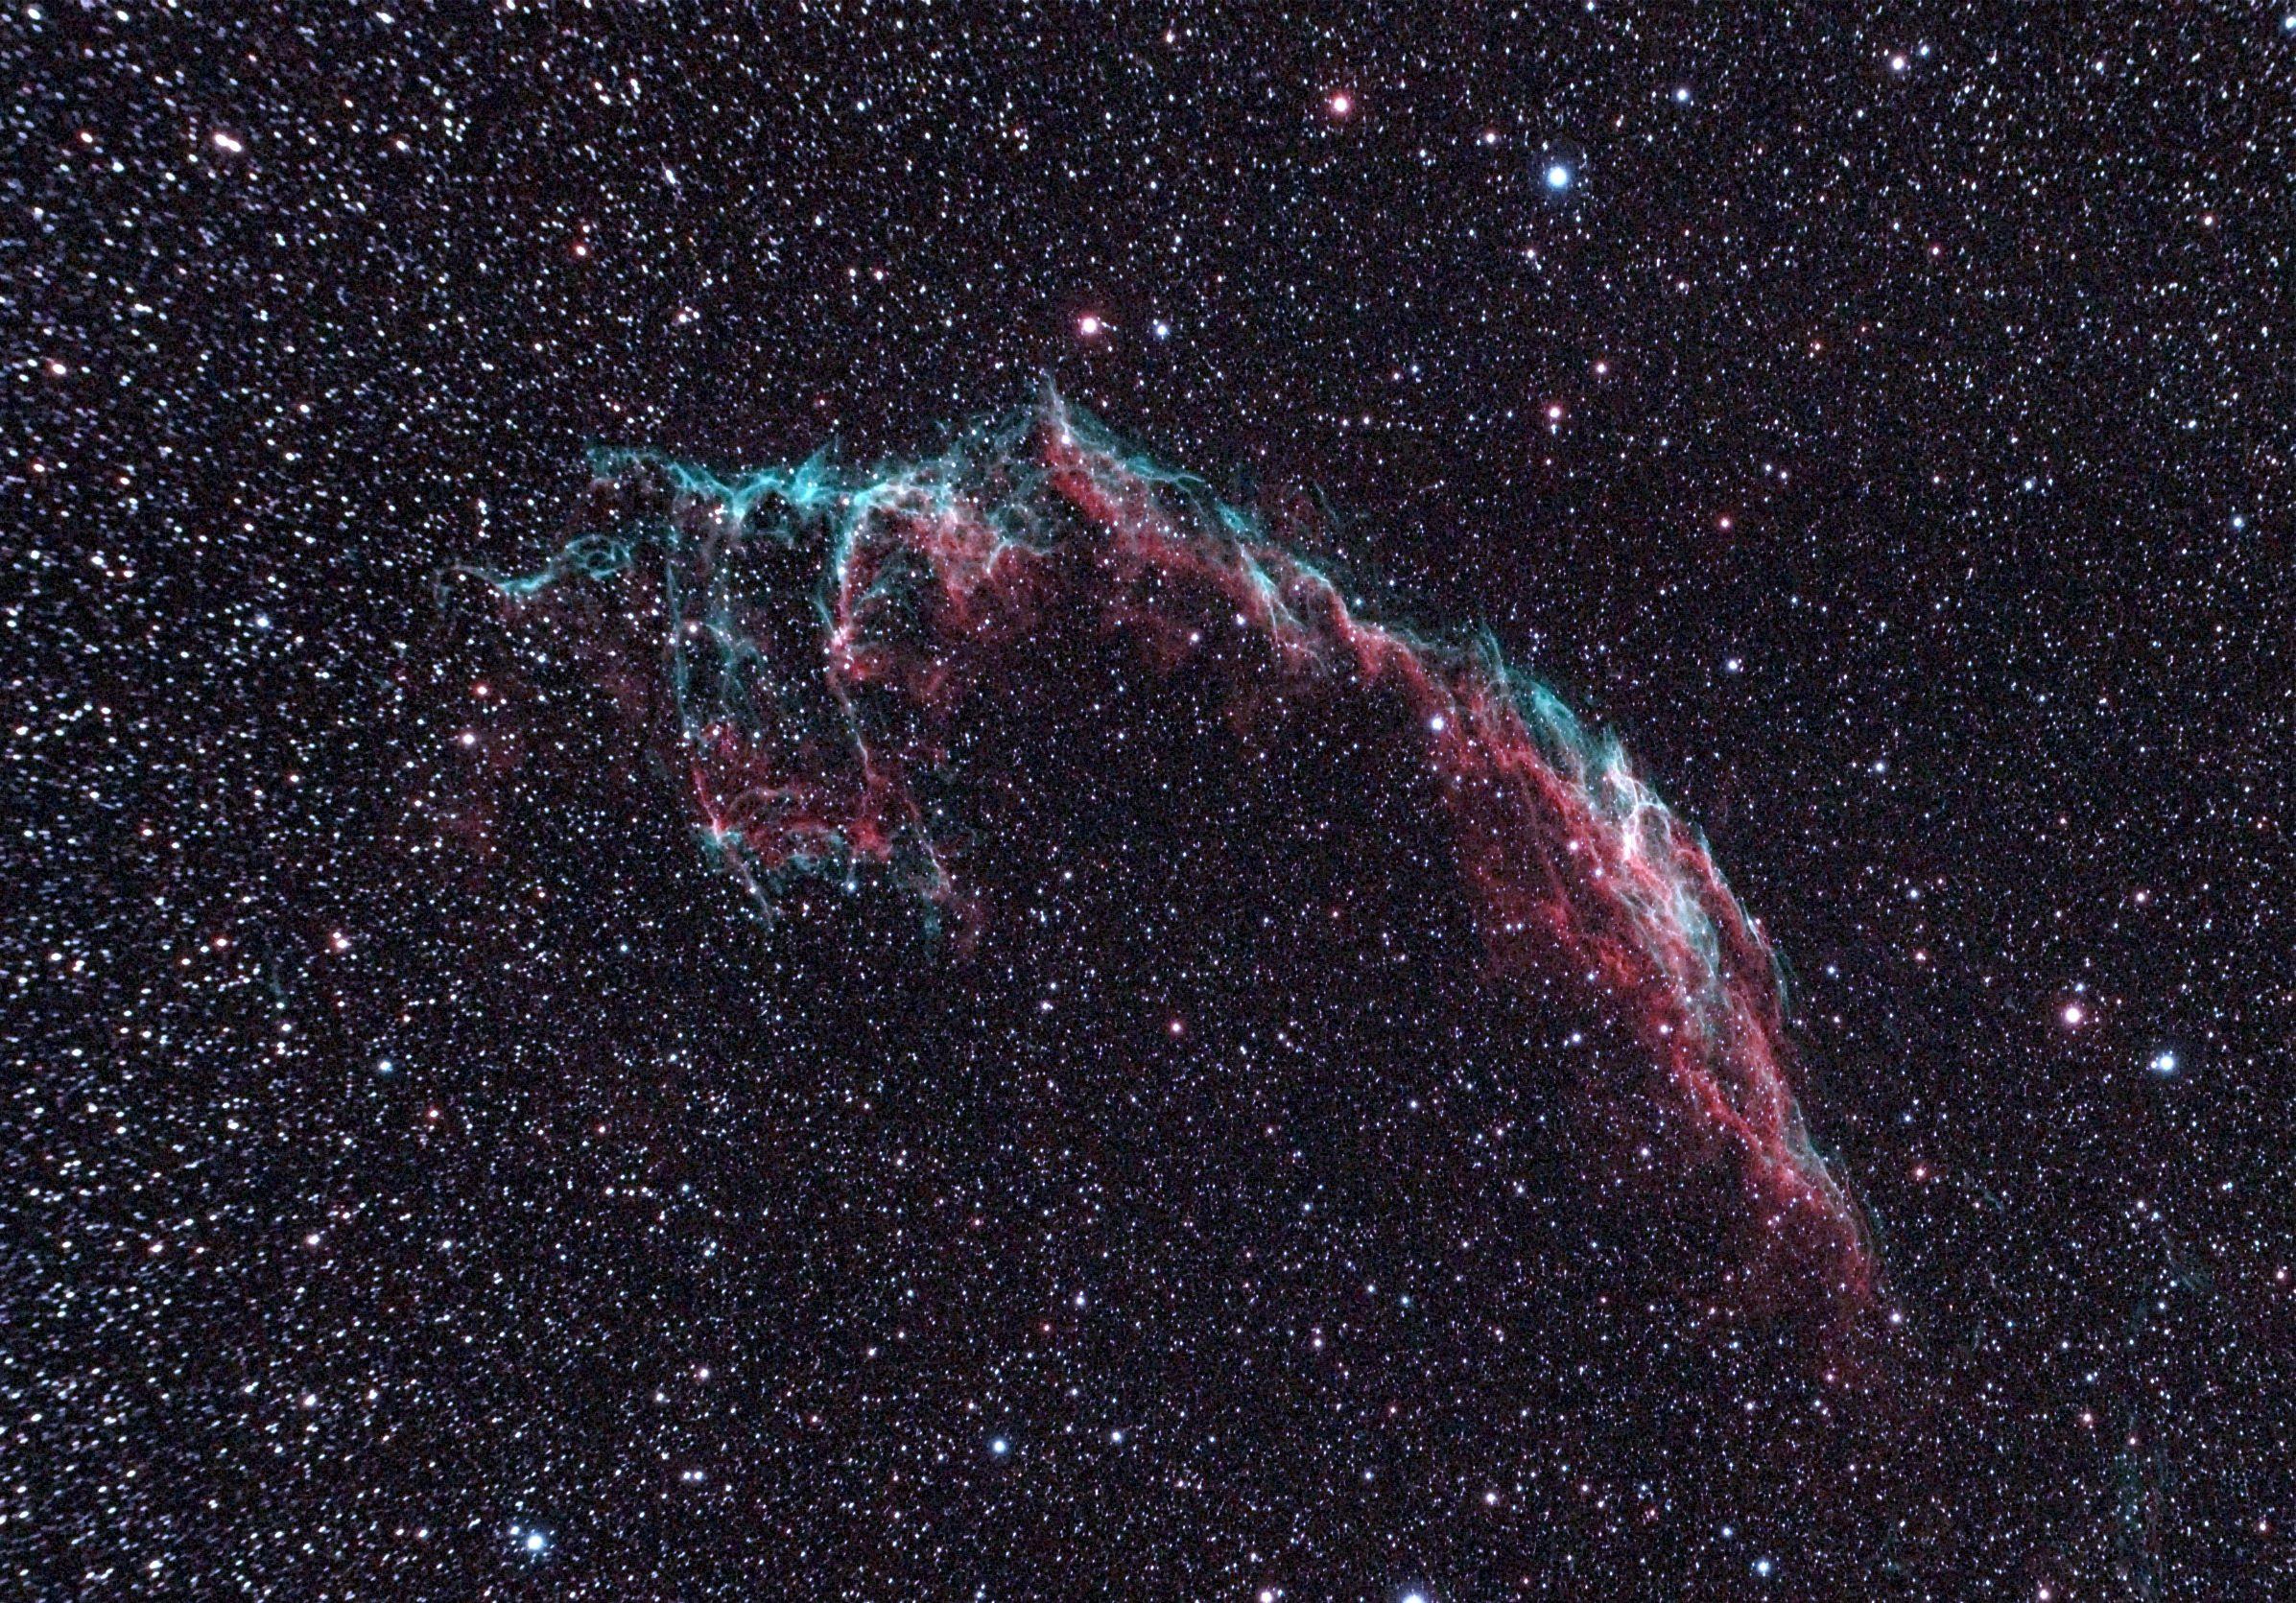 NGC6992_300819_Siril1_01_DarktableGimpRed.jpg